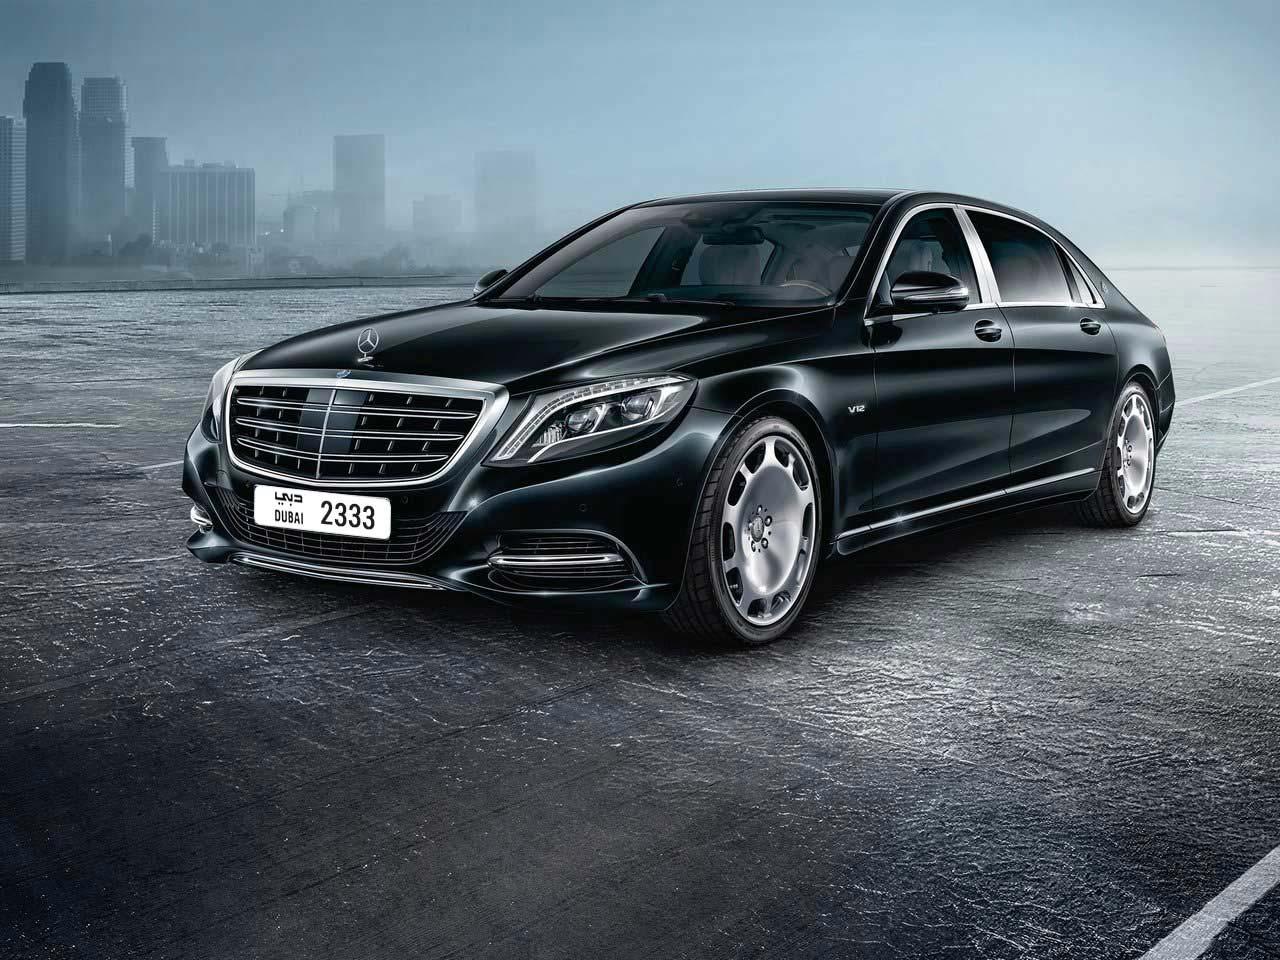 Rent Mercedes S 550 in Dubai - Big Boss Luxury Car Rental